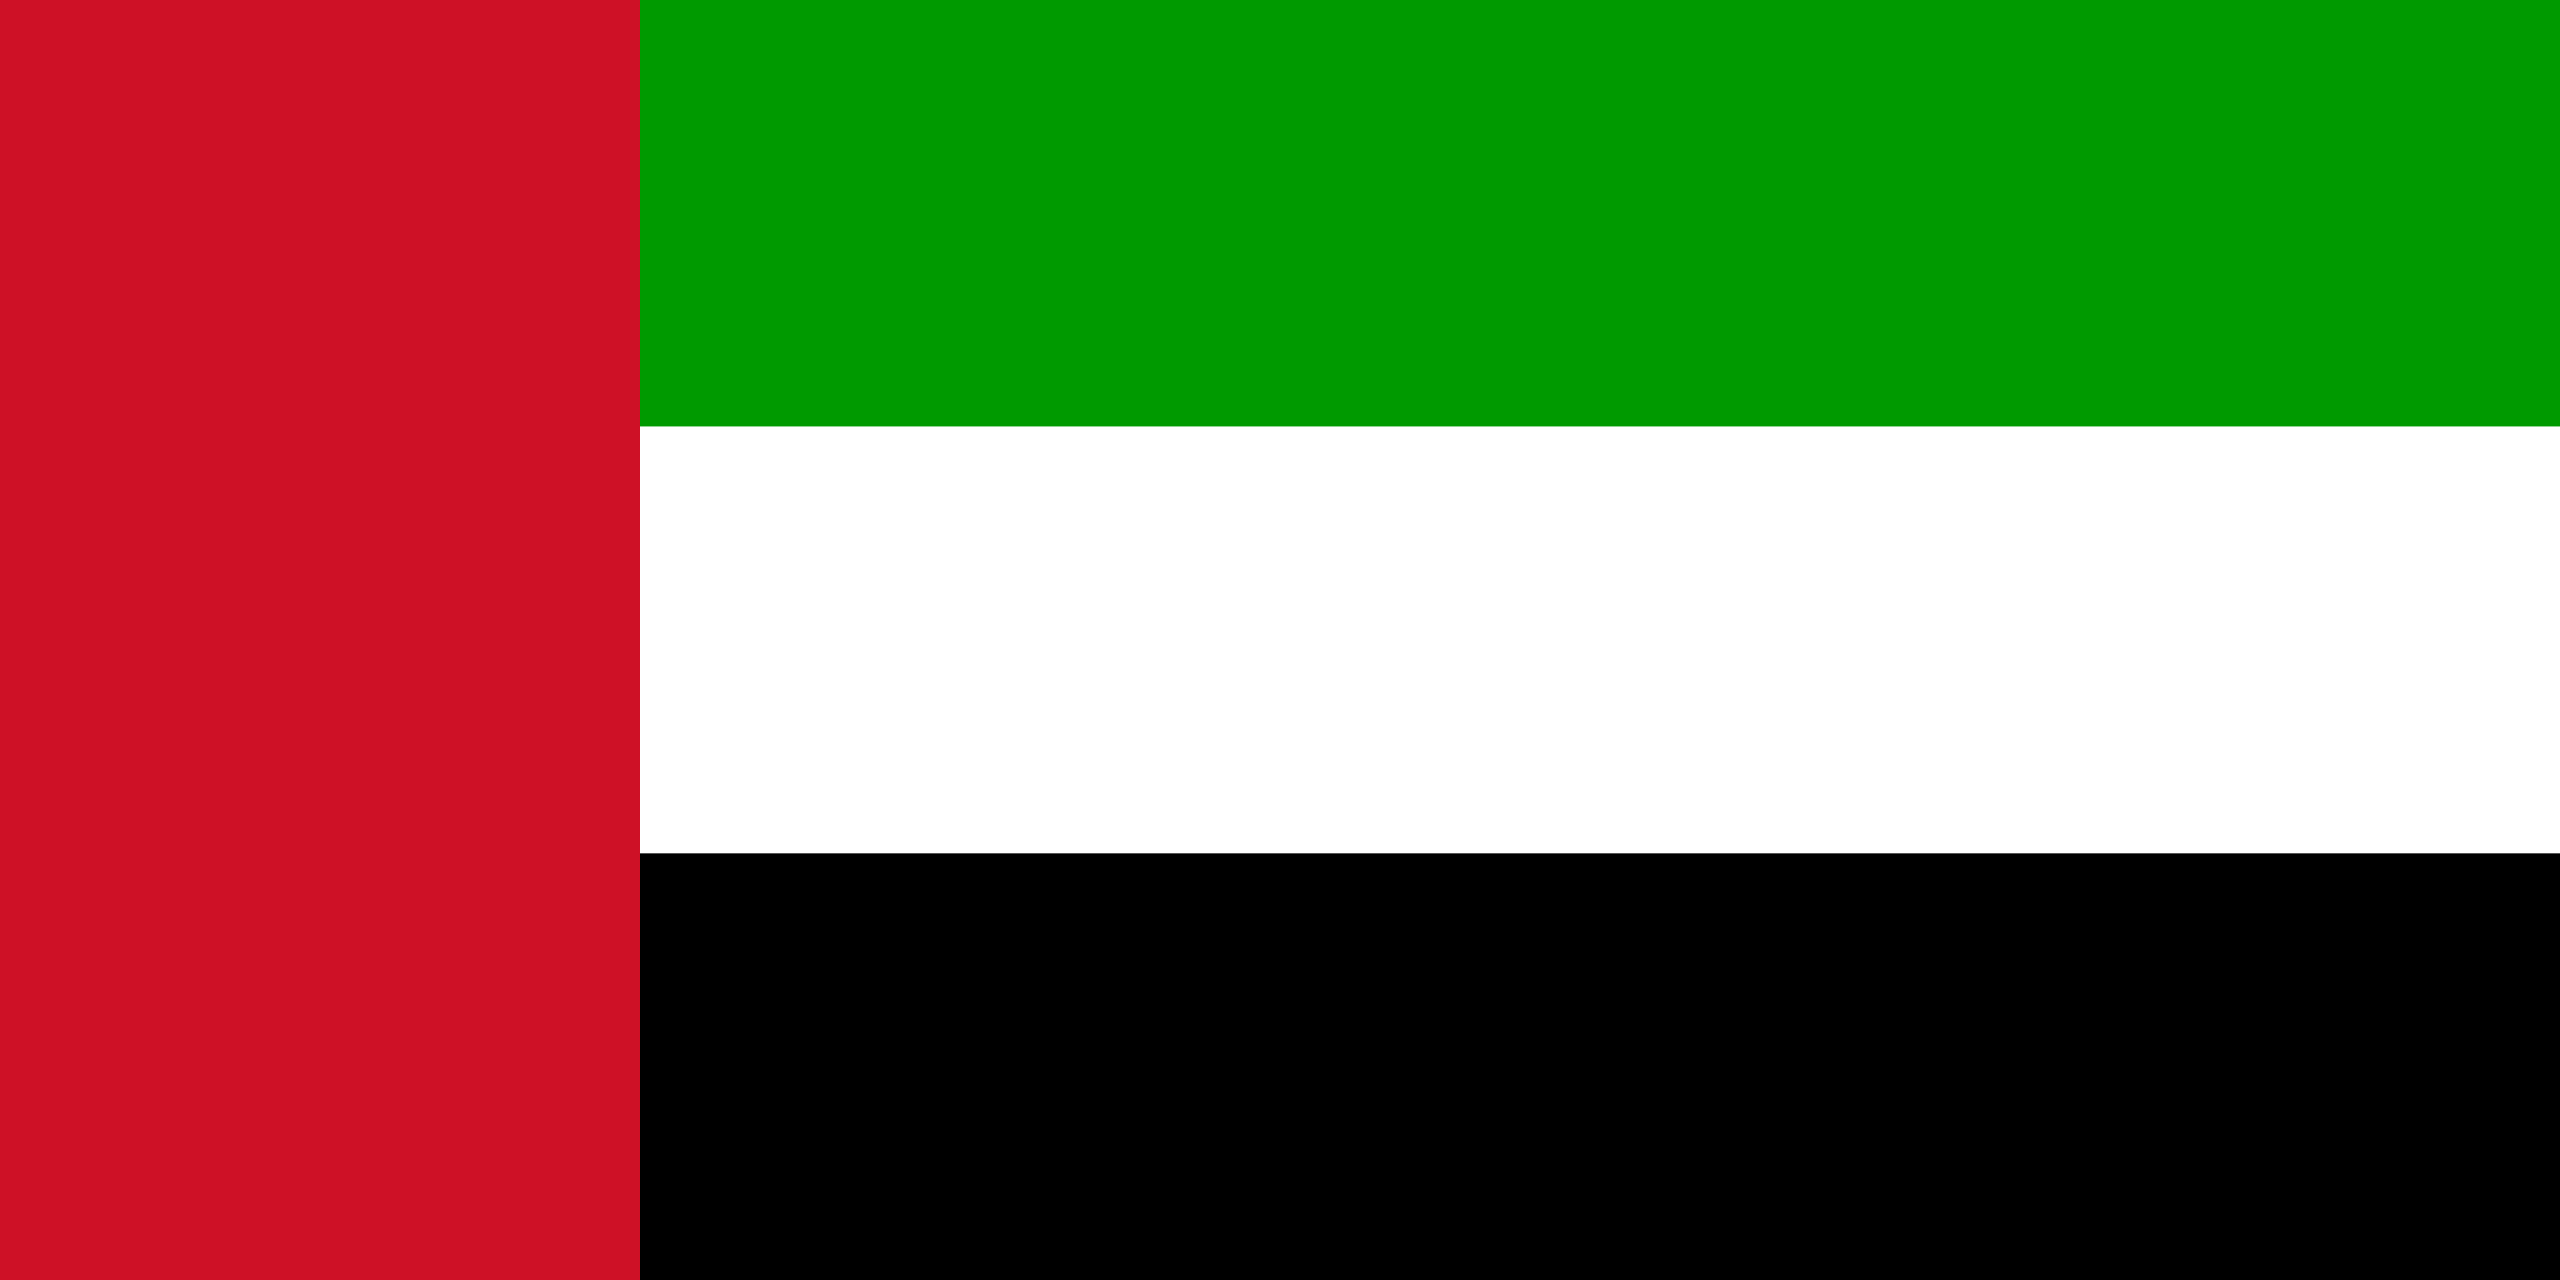 Emiratos Árabes Unidos - bandera